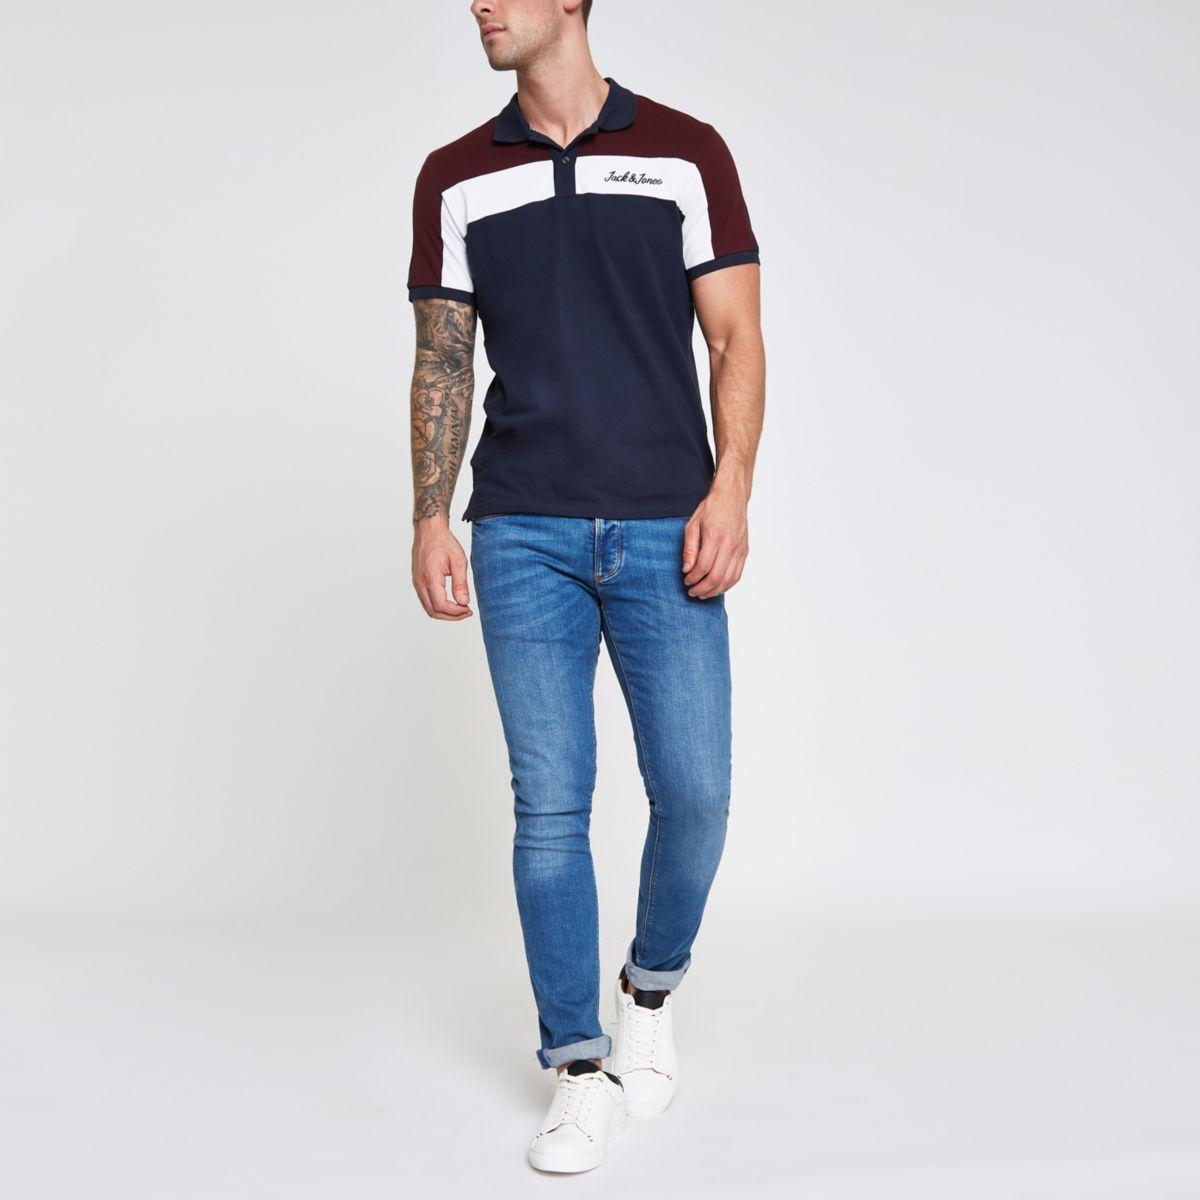 Jack & Jones navy colour block polo shirt